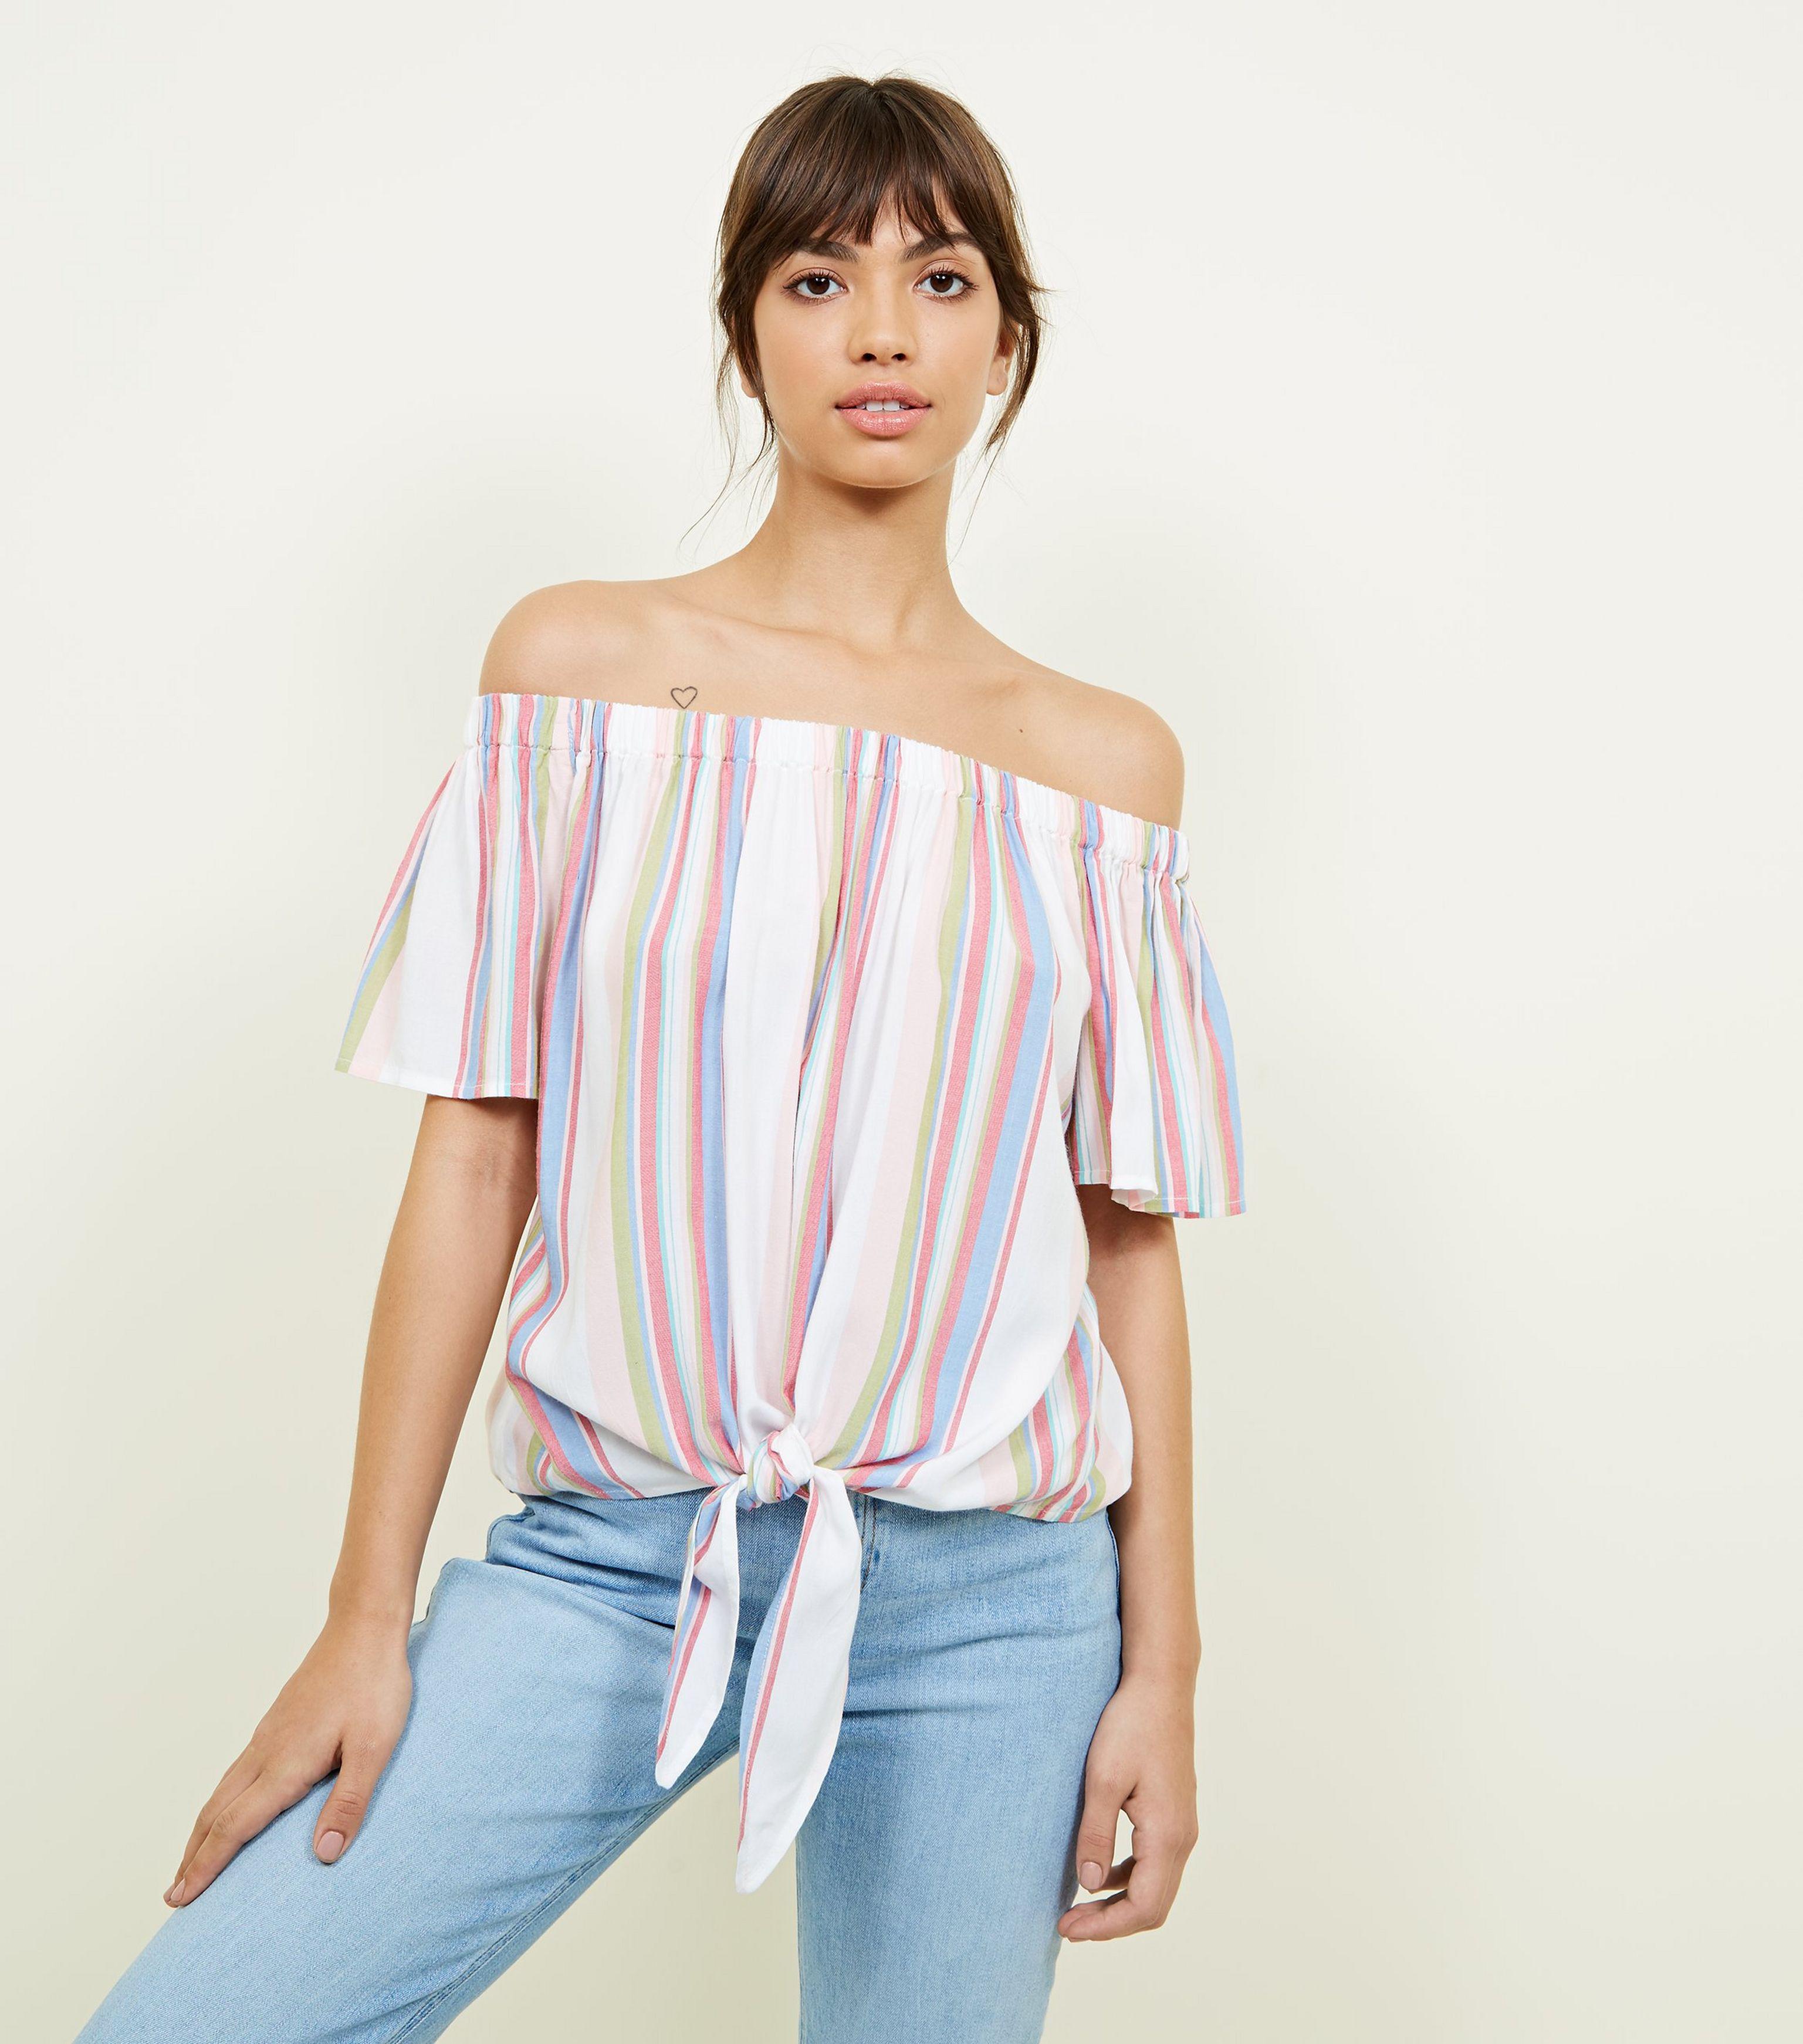 0b64391c4f0 New Look White Multi Stripe Tie Front Bardot Top in White - Lyst